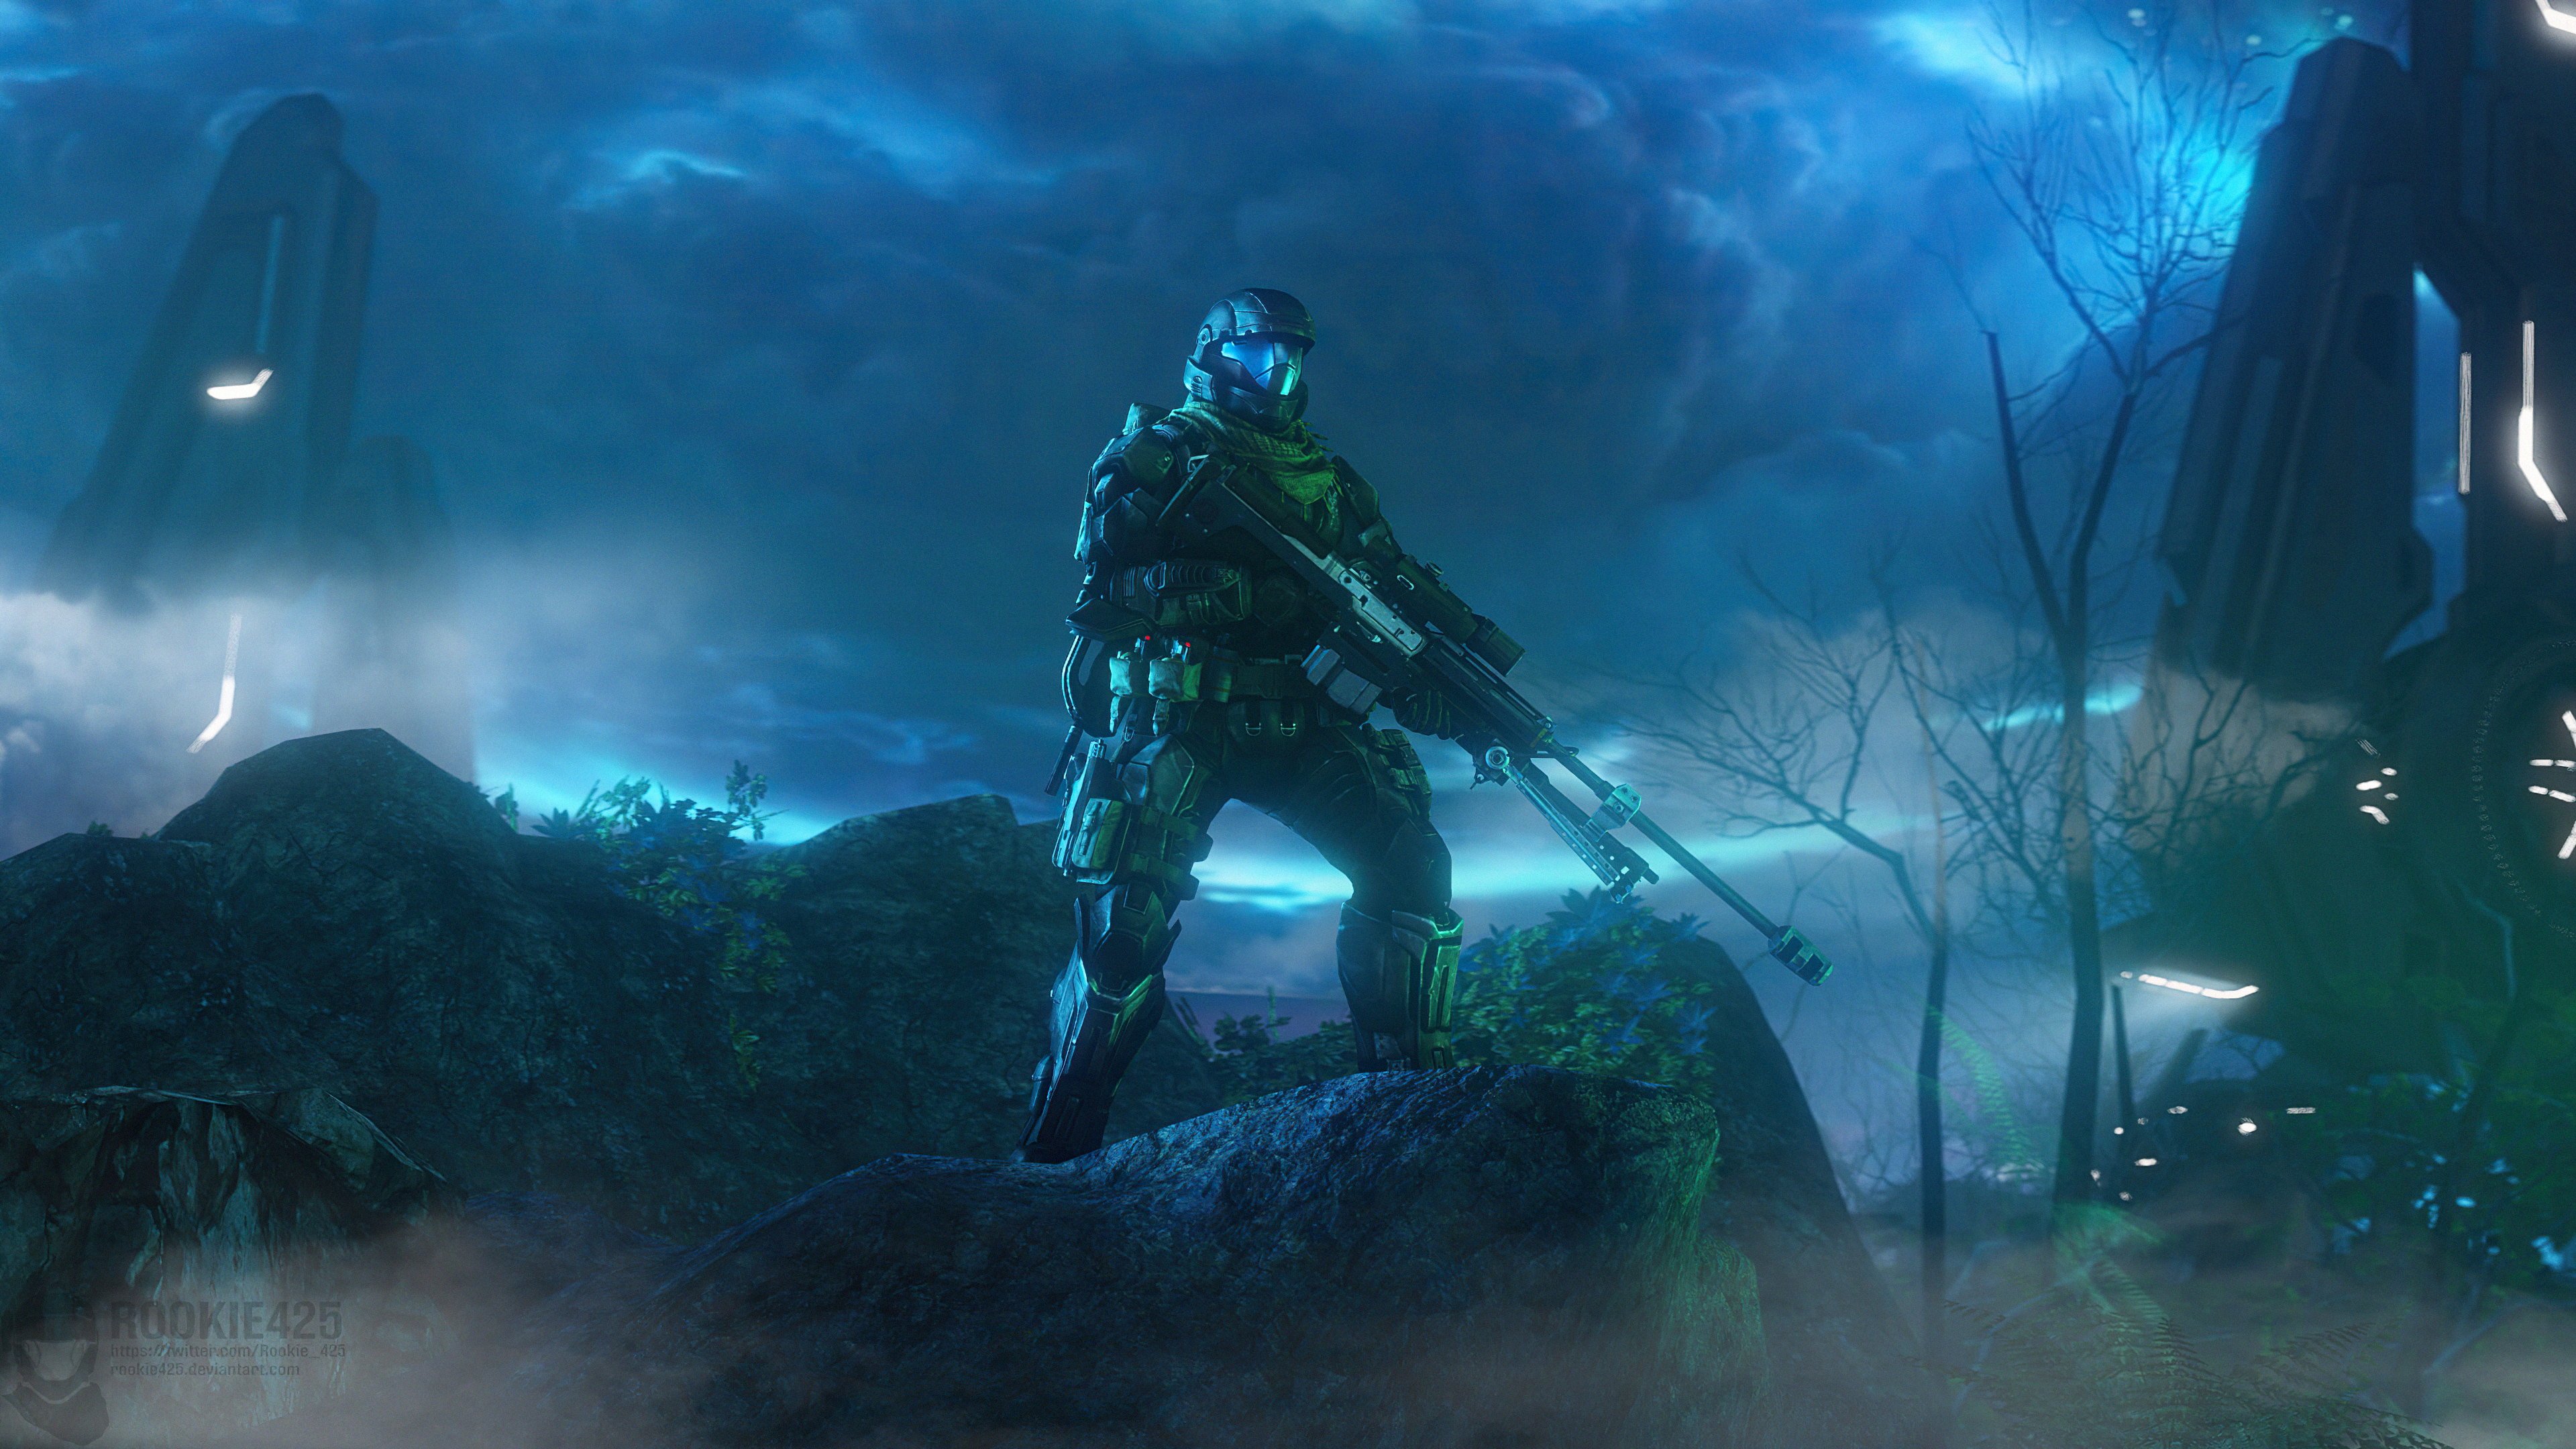 Fondos de pantalla Escena con neblina Halo